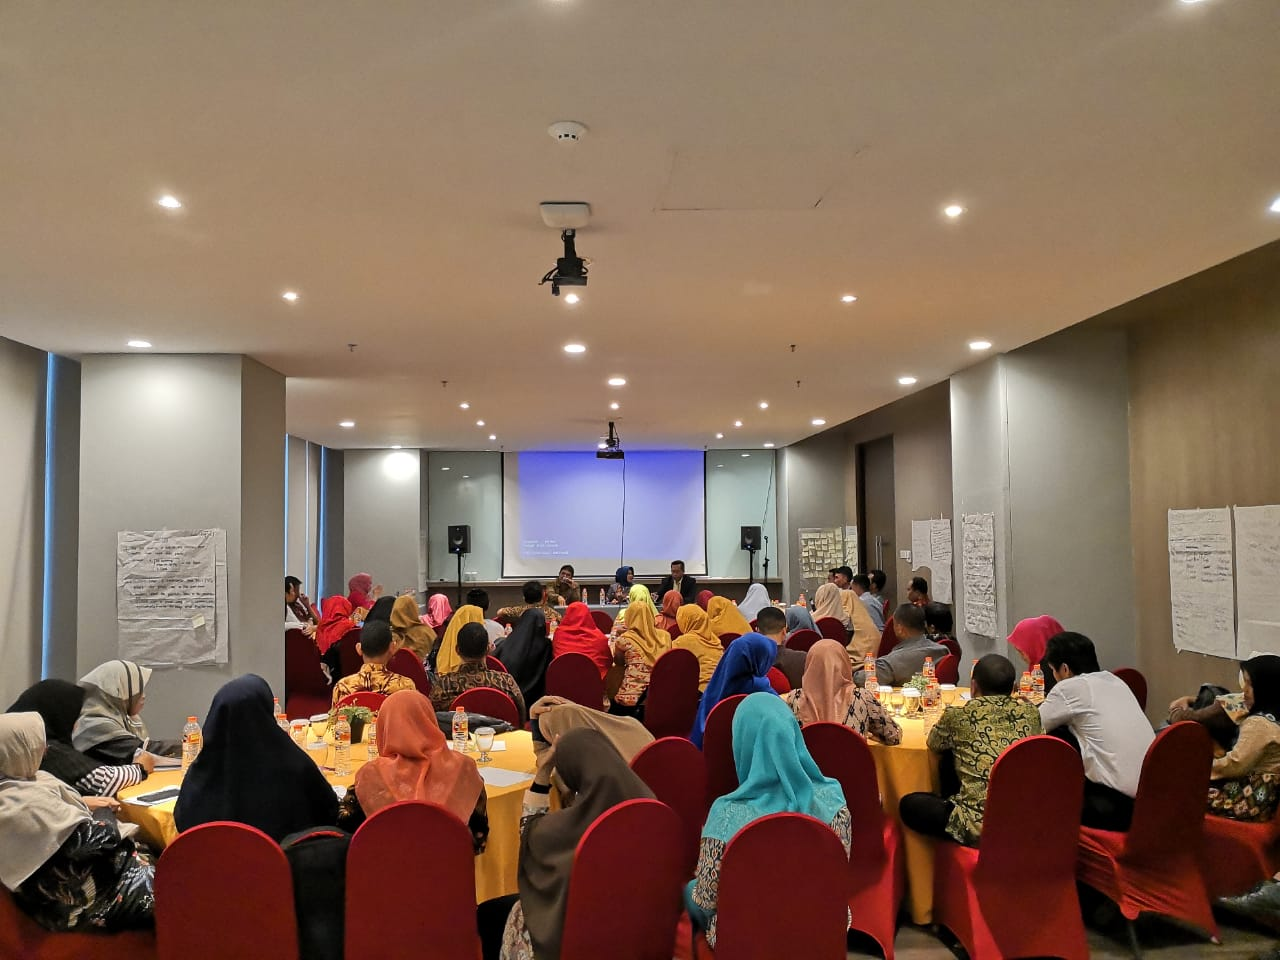 Guru-guru bahasa Inggris madrasah se Sulselbar Ikuti pengembangan profesi dan karier guru di Hotel Gammara Jalan Metro Tanjung Bunga Makassar (Foto: Istimewa/zonatimes.com)